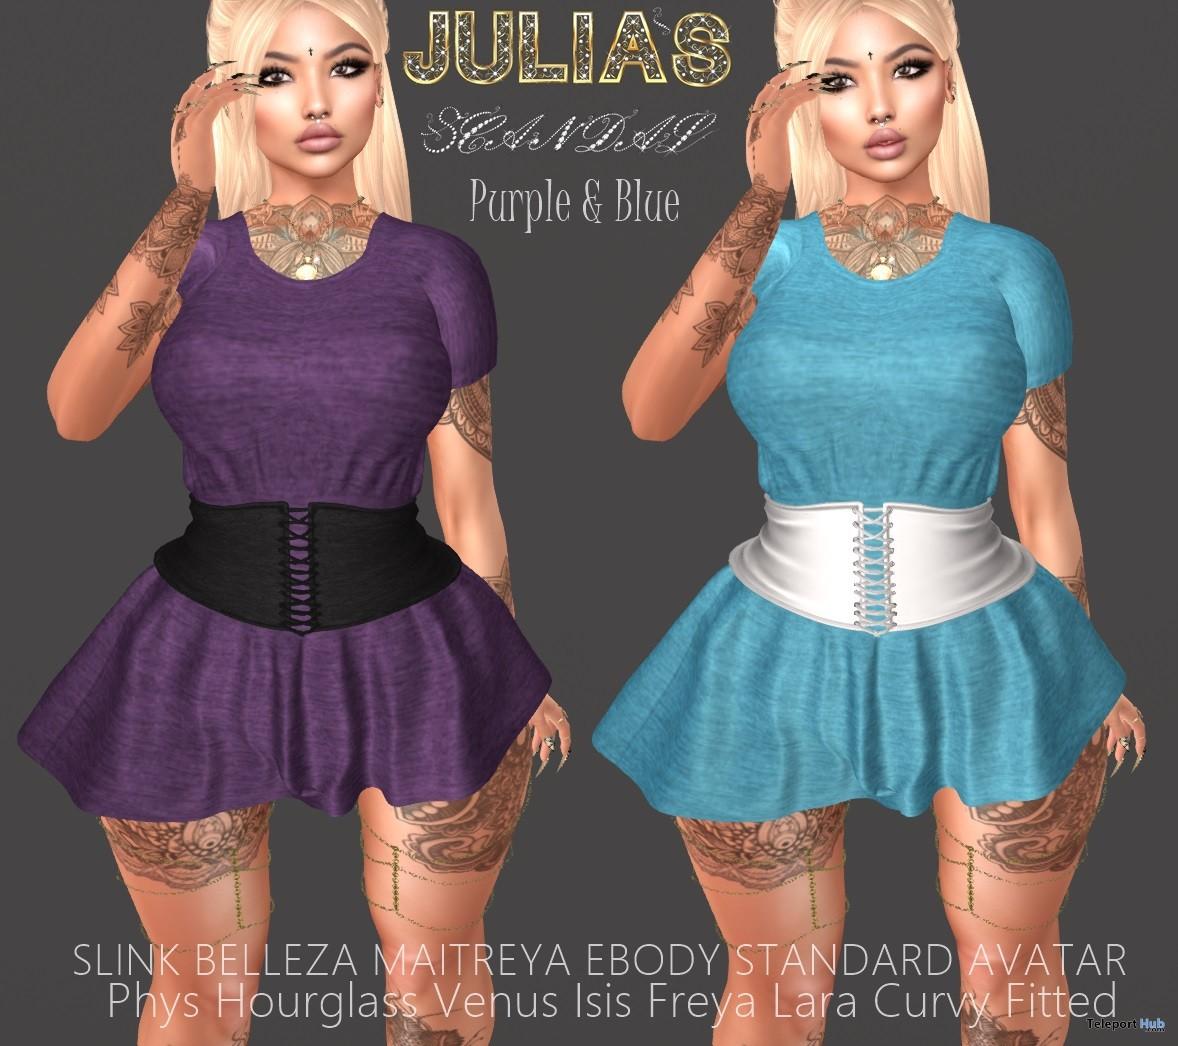 Sophia Dress Blue & Purple February 2018 Group Gift by Julia's Scandal- Teleport Hub - teleporthub.com